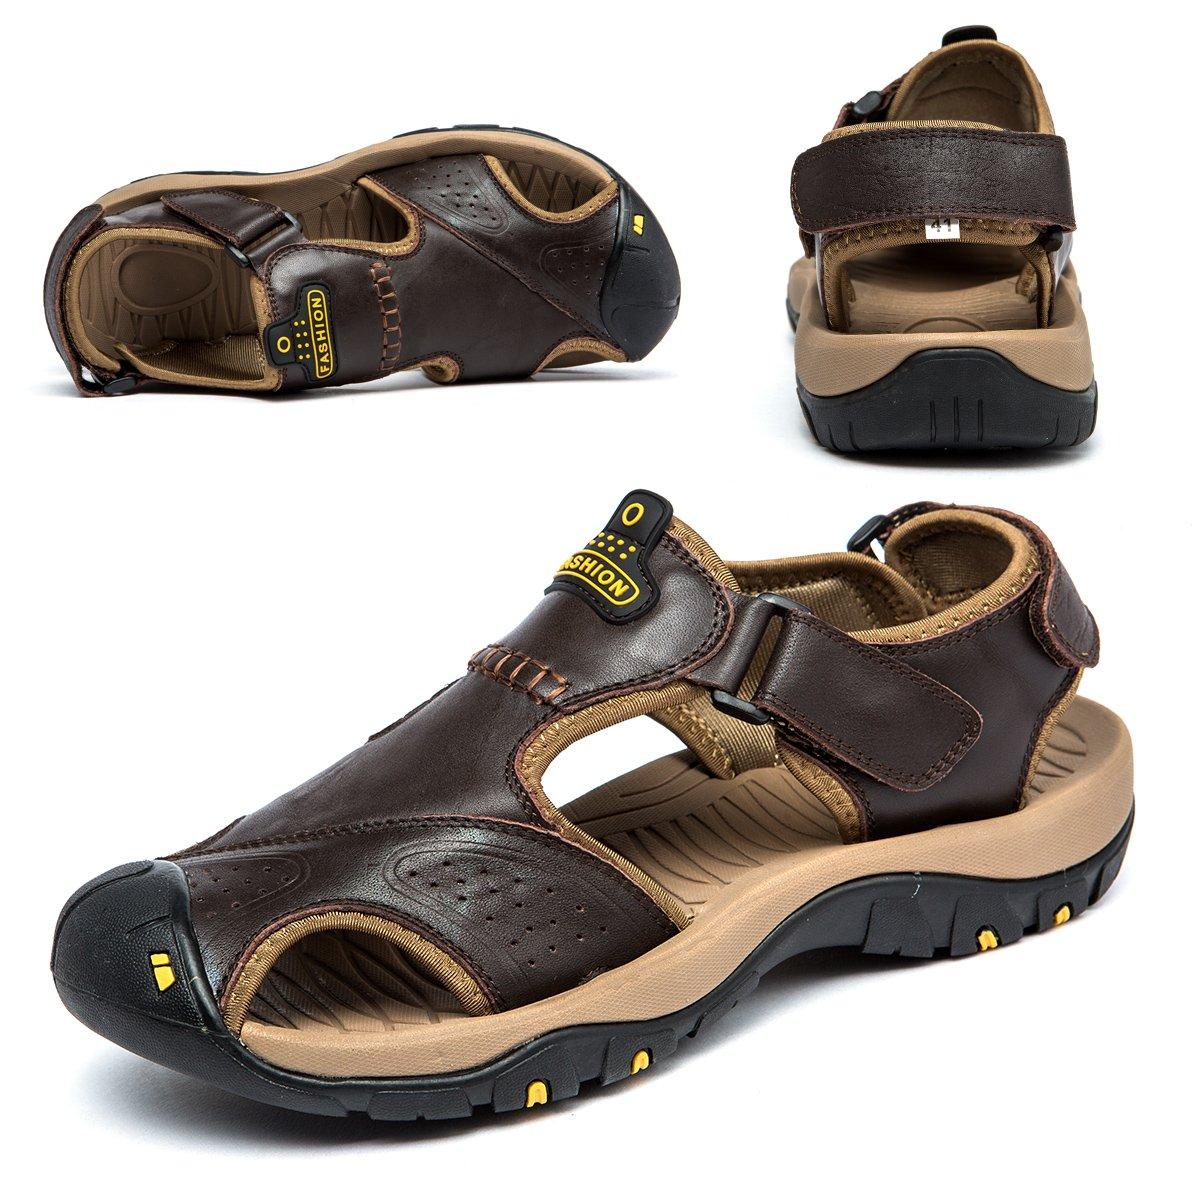 BINSHUN Mens Leather Sandals Sports Outdoor Fisherman Athletics Hiking Shoes Beach Adustable Water Sandal(deepbrown45/11)